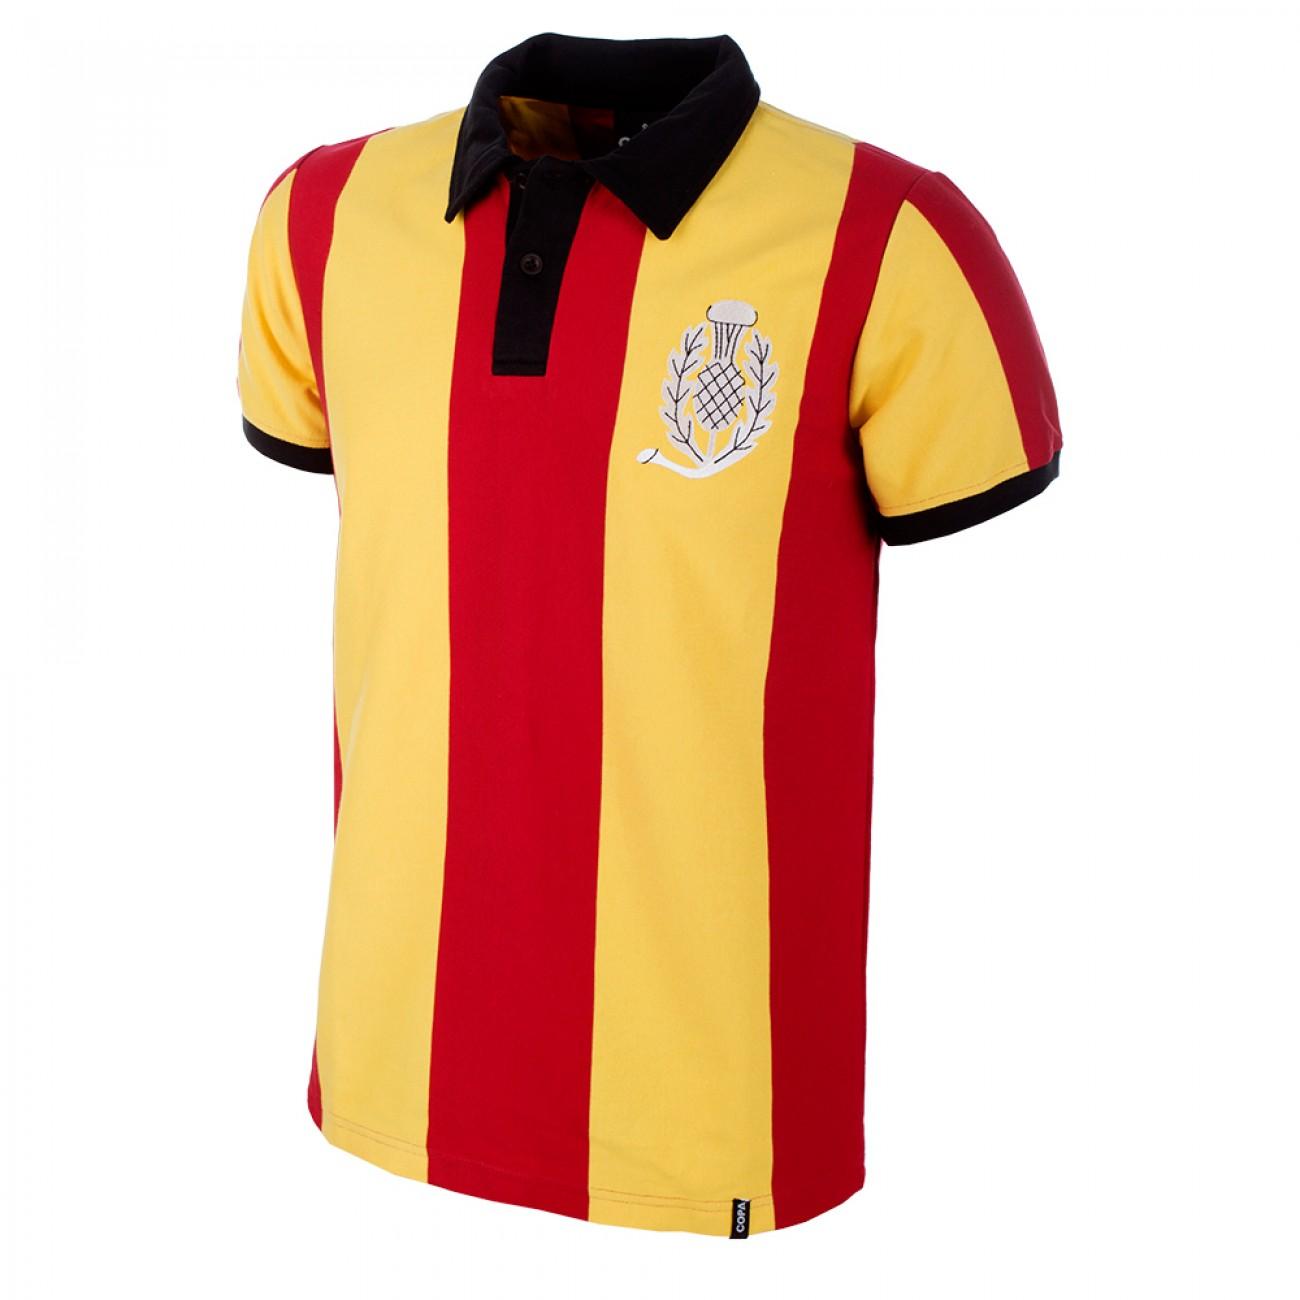 http://www.retrofootball.es/ropa-de-futbol/camiseta-patrick-thistle-1977.html